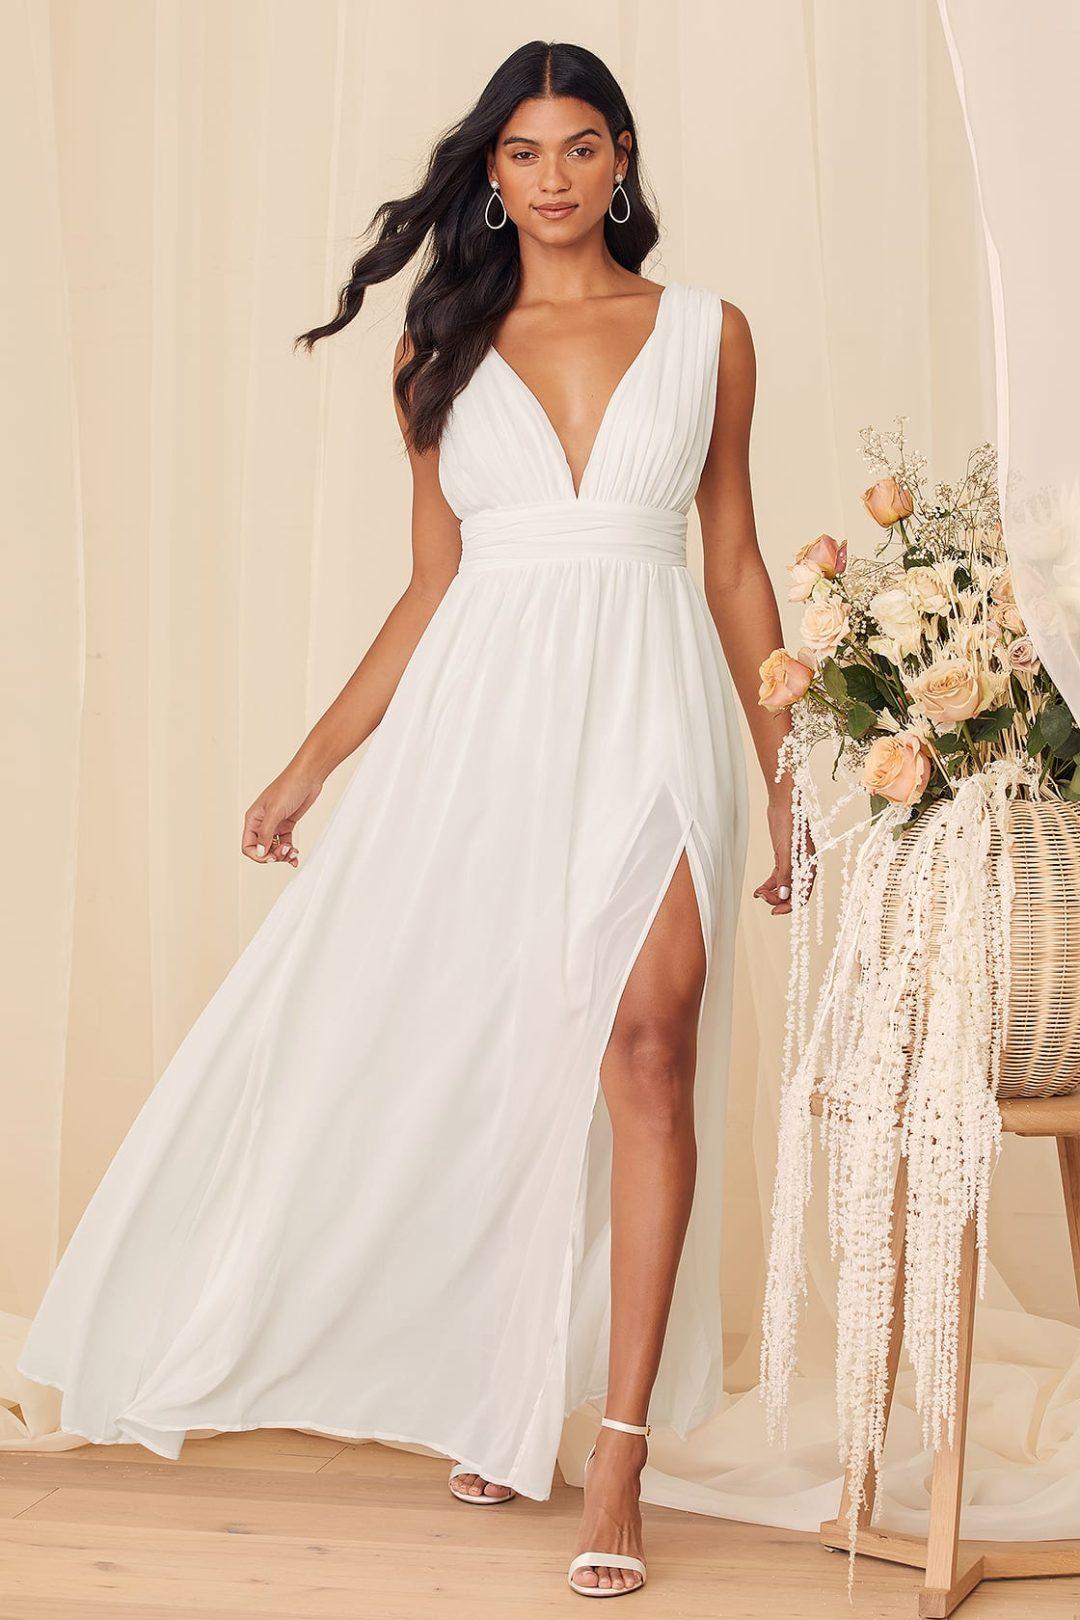 White chiffon wedding dress under $100